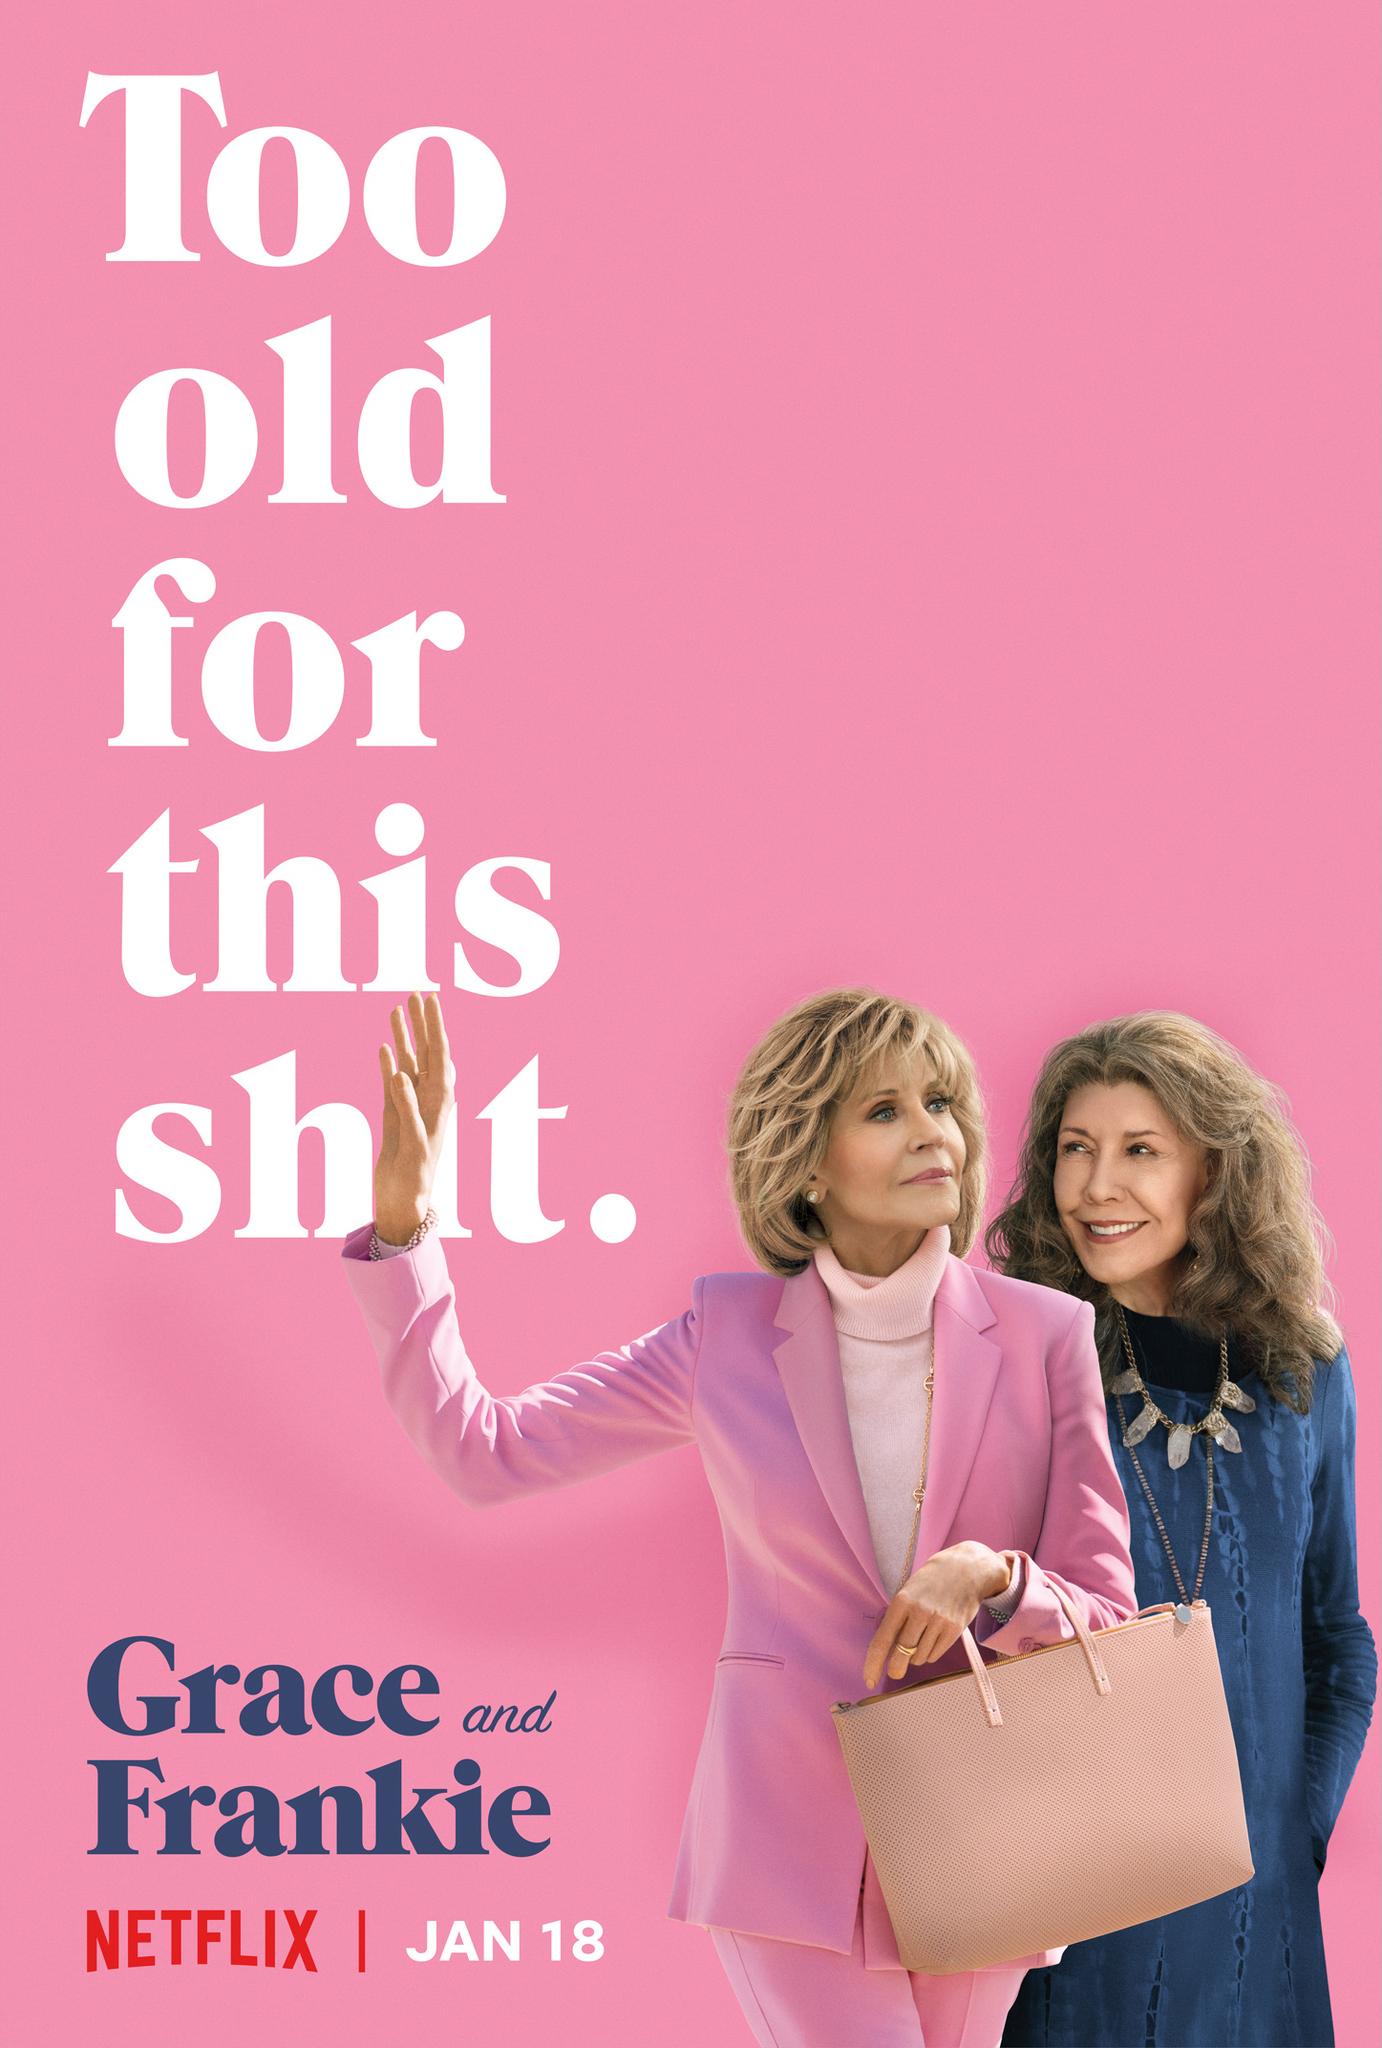 Grace and Frankie Season 5 Poster.jpg